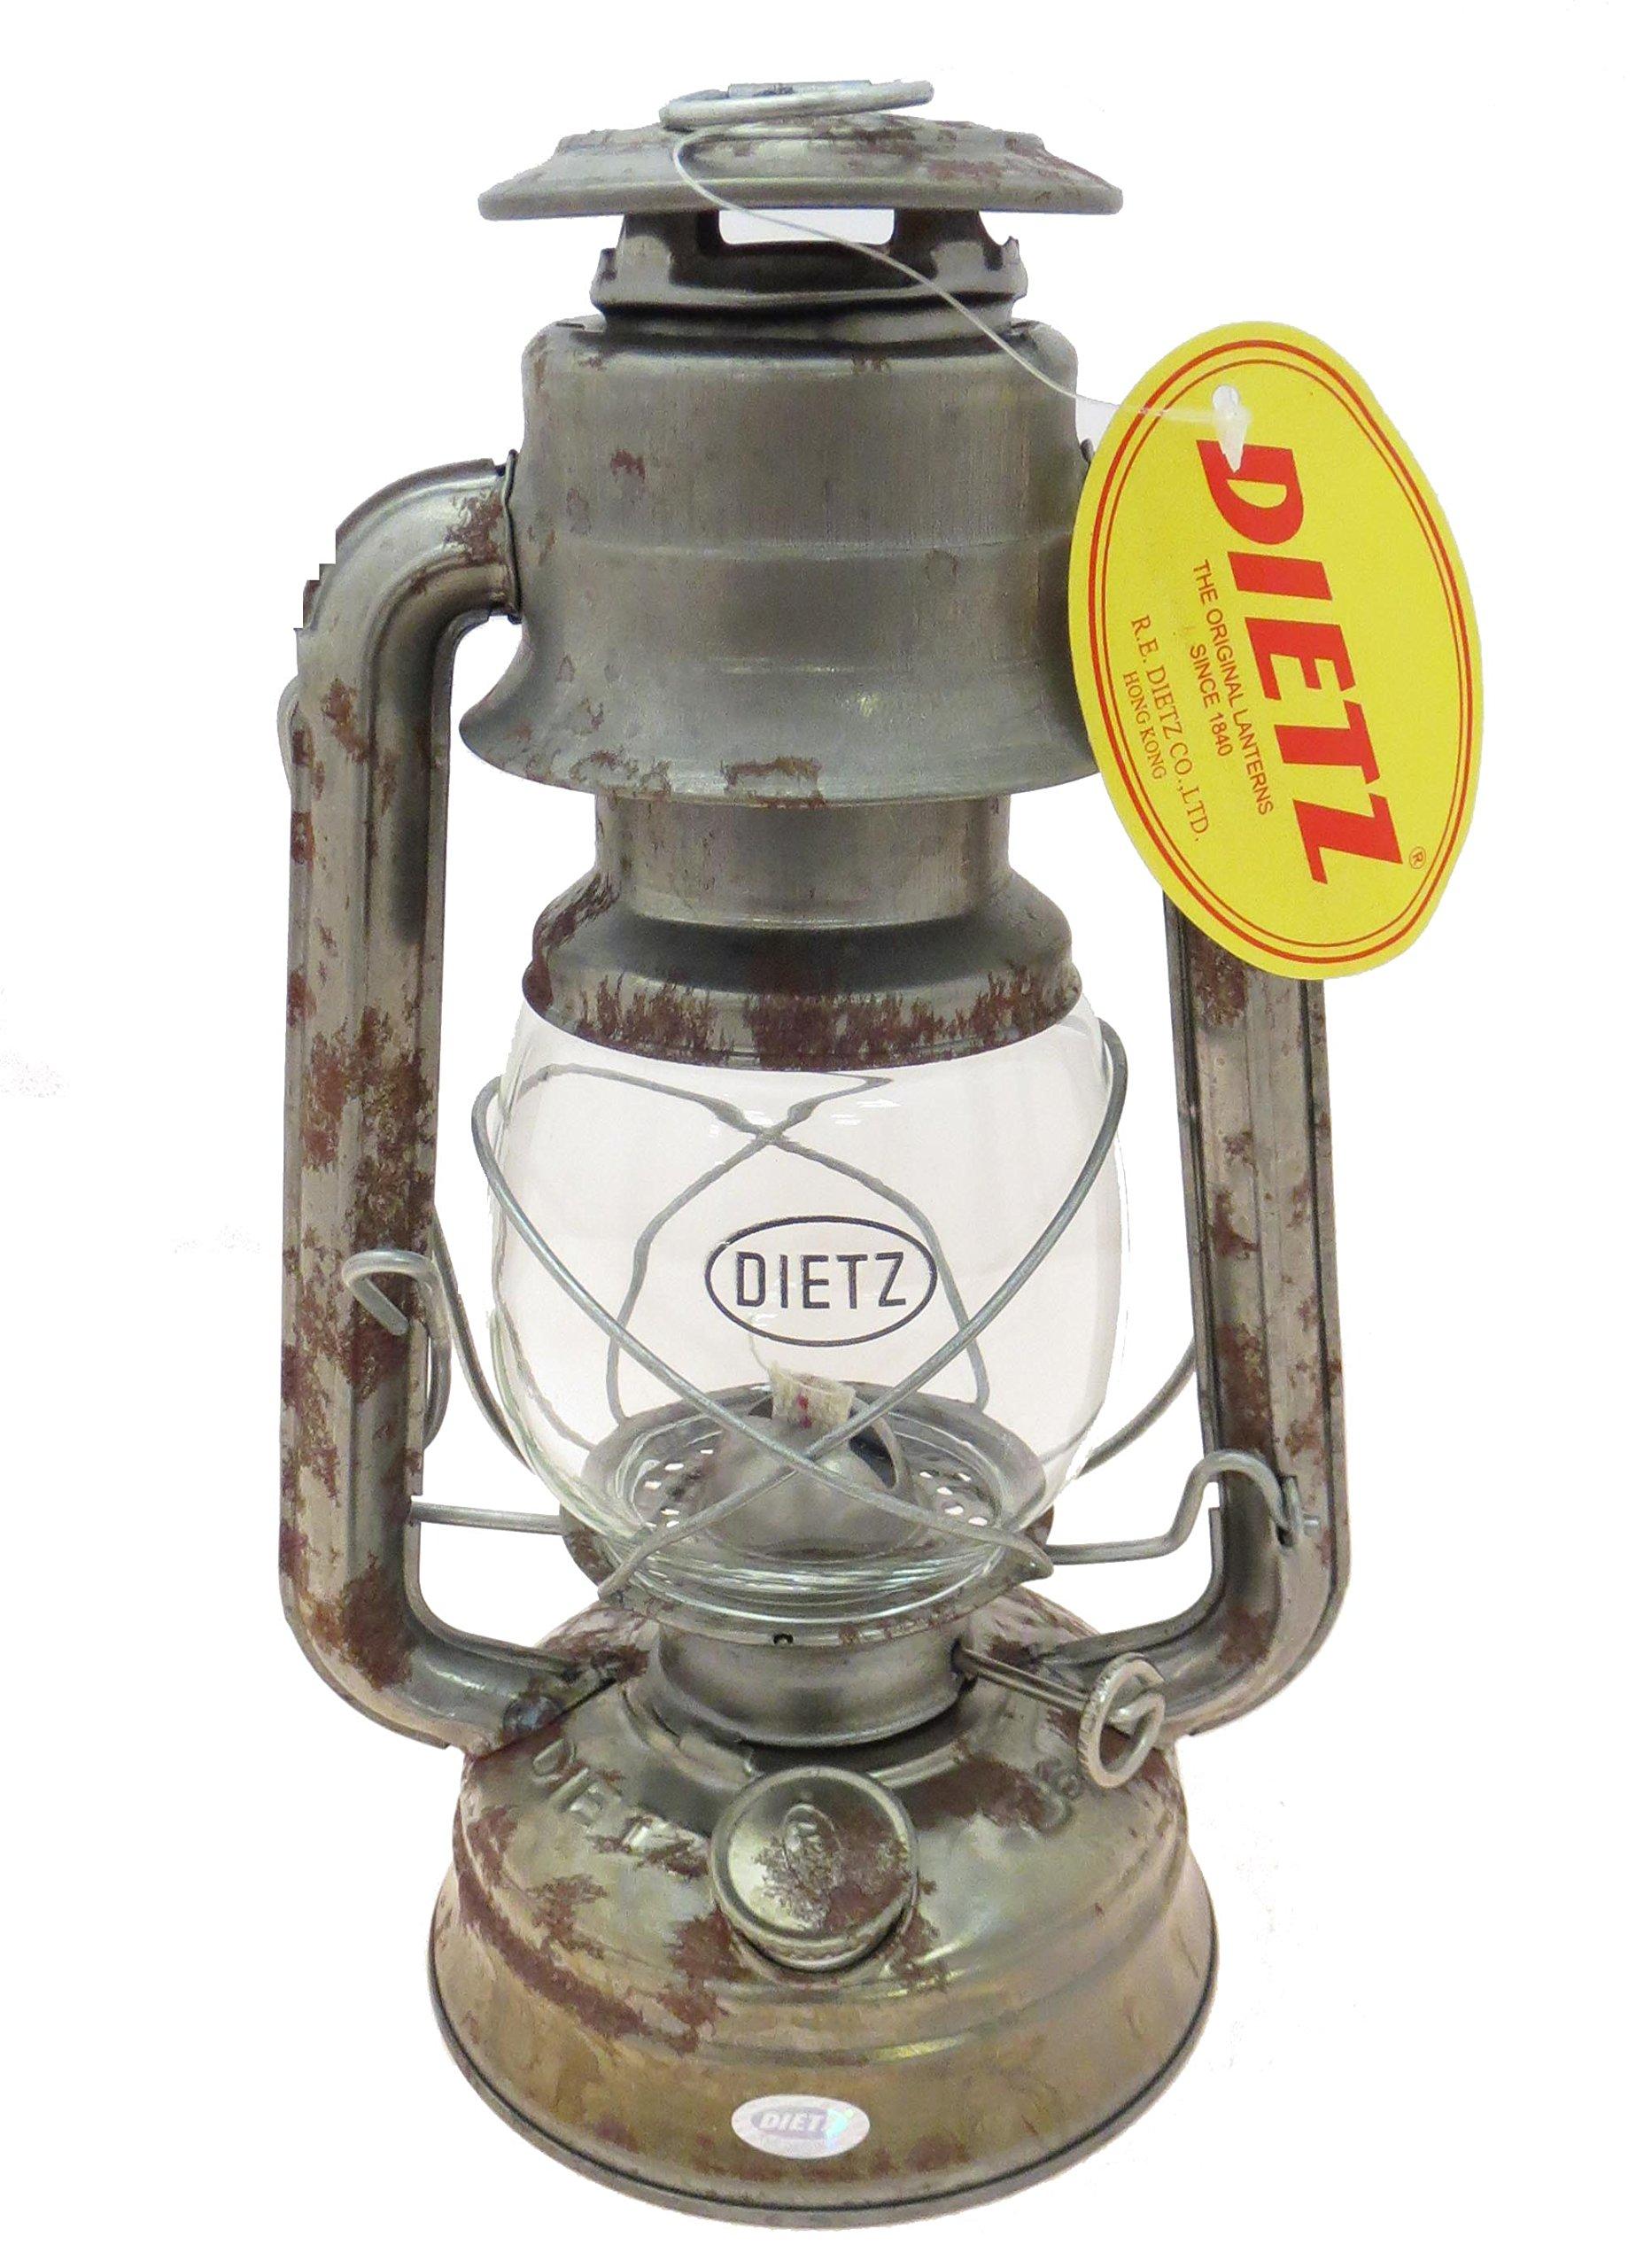 Dietz #76 Original Oil Burning Lantern (Unfinished (rusty))